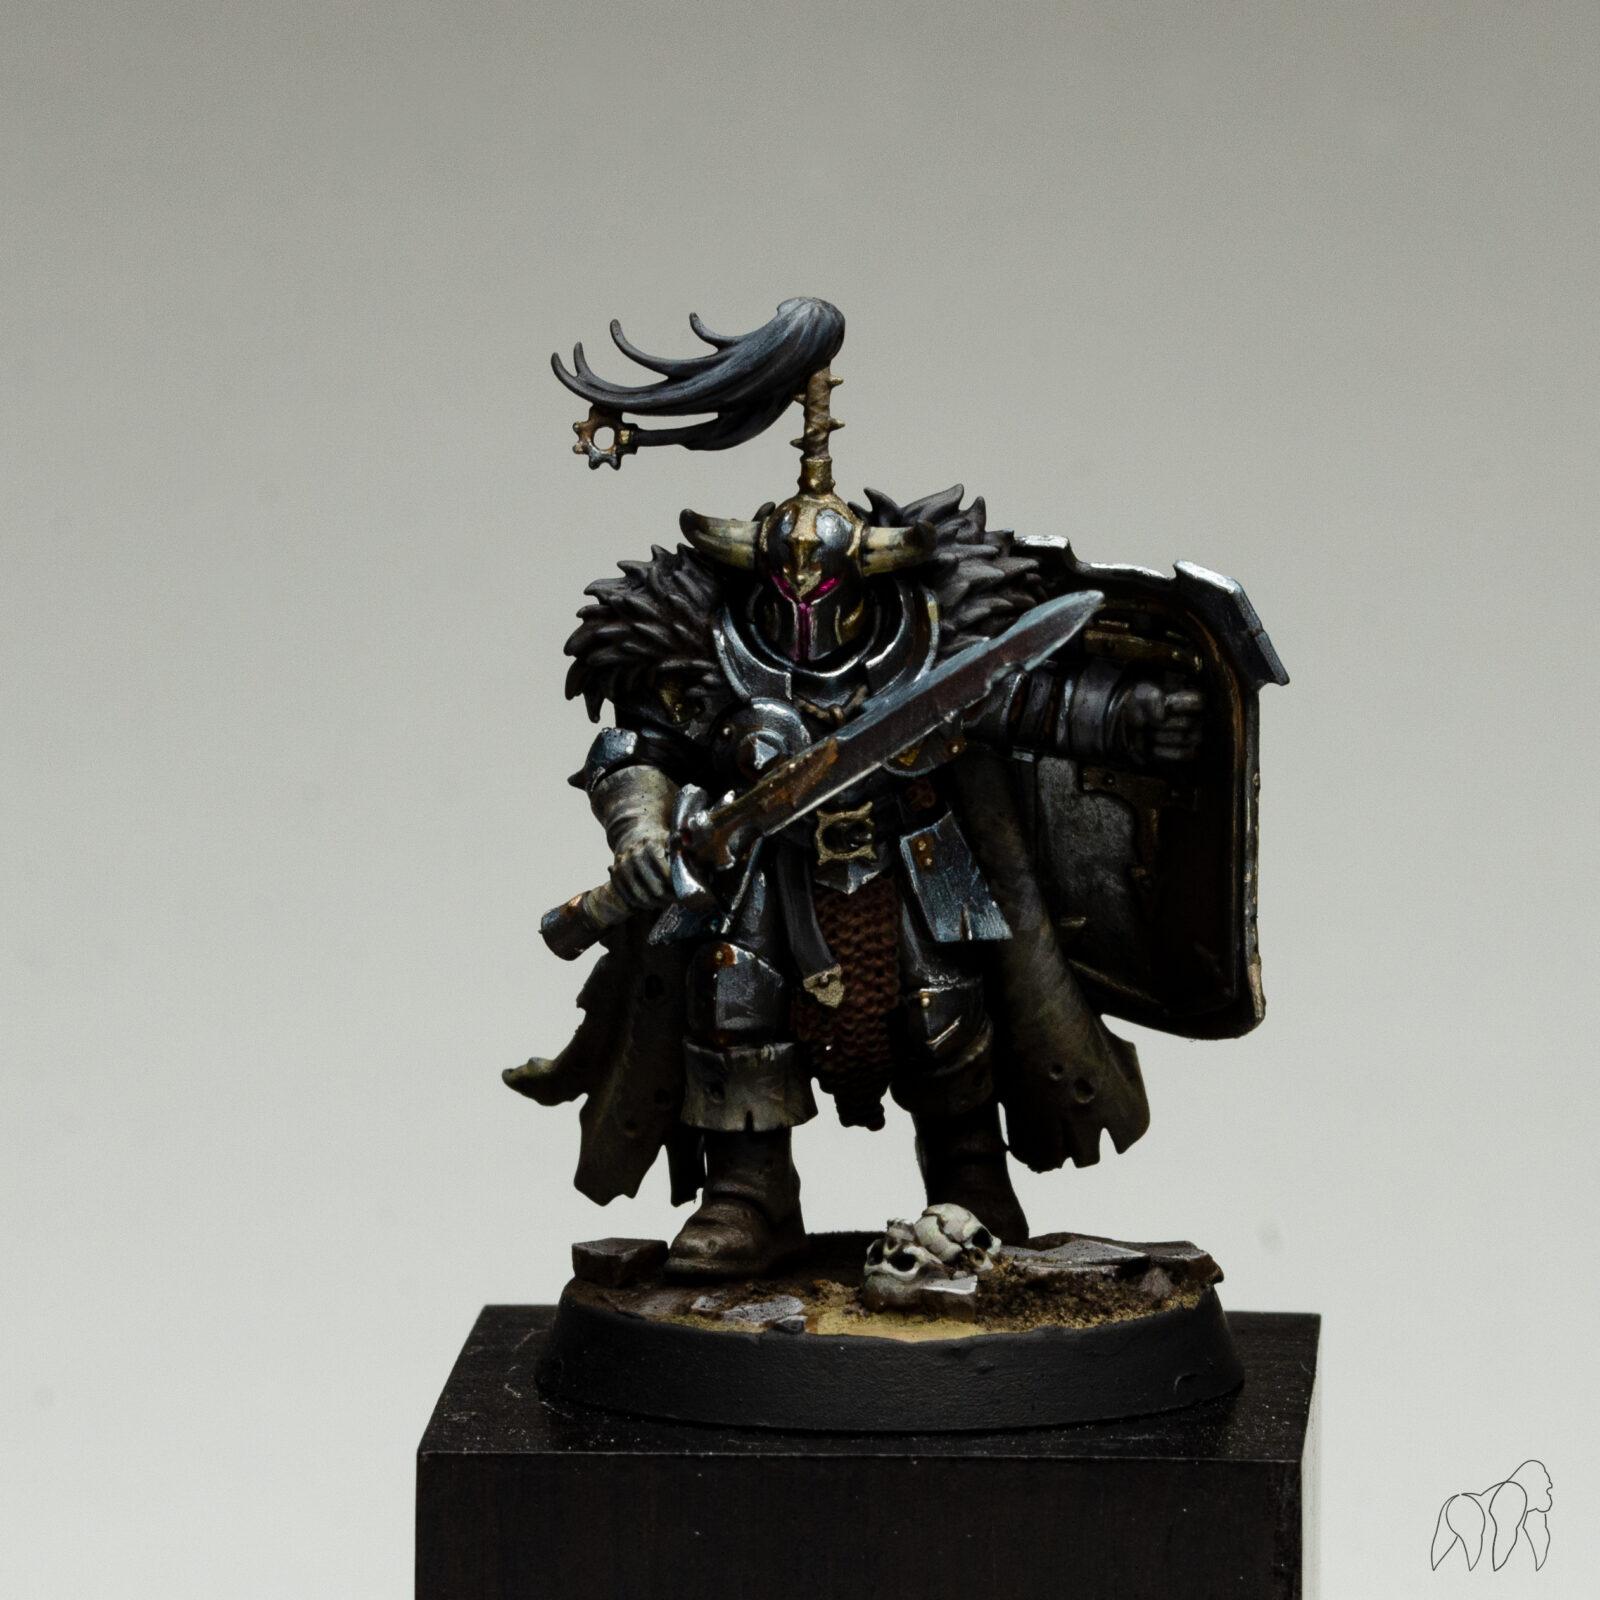 Chaoswarrior12